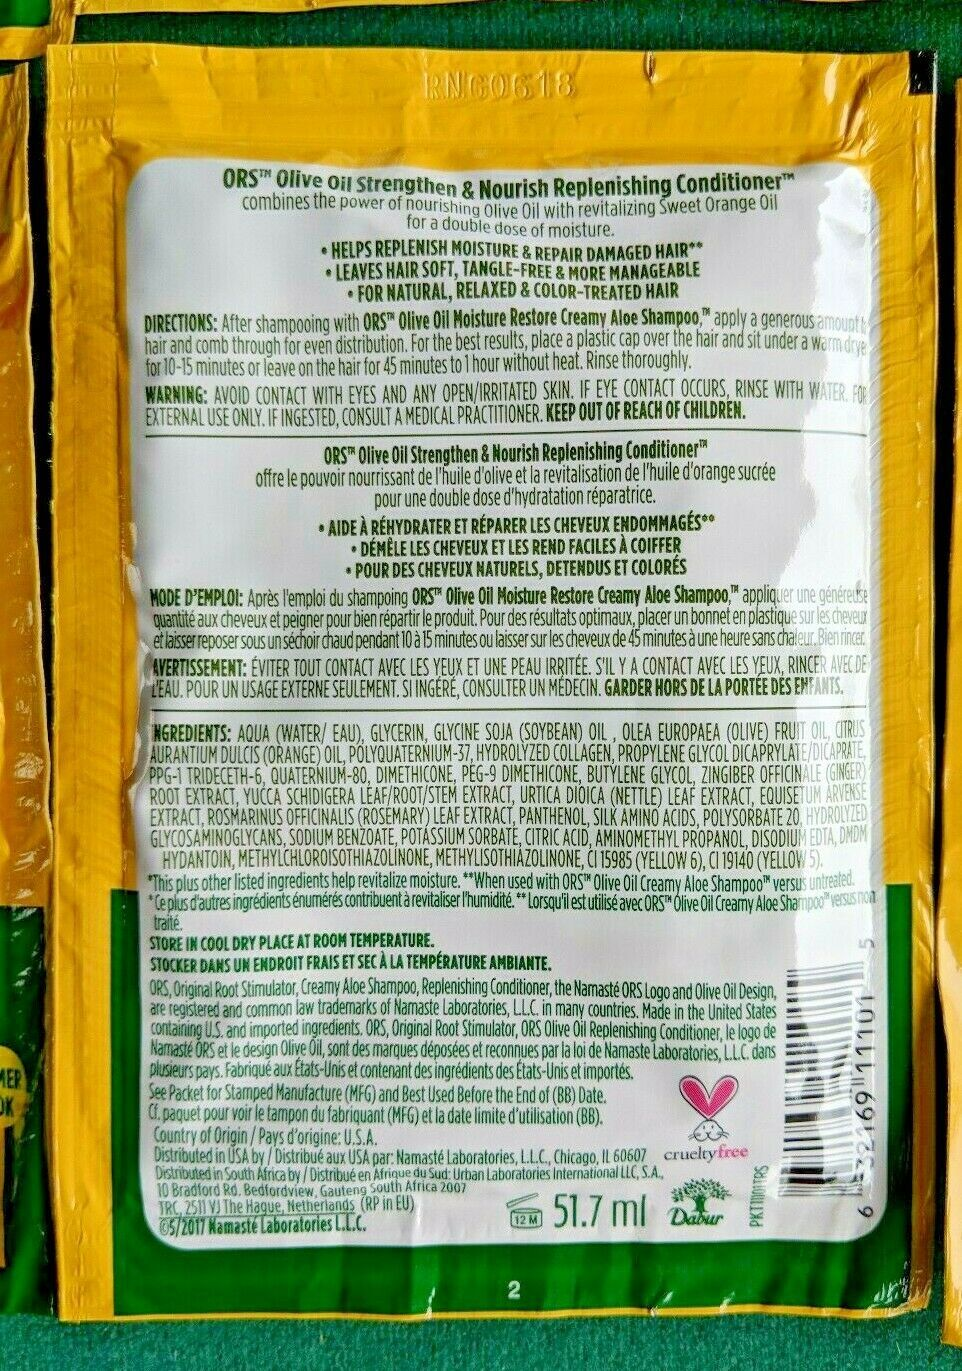 Lot 8 ORS Olive Oil Replenishing Conditioner Sweet Orange Revitalizing 1.75 oz